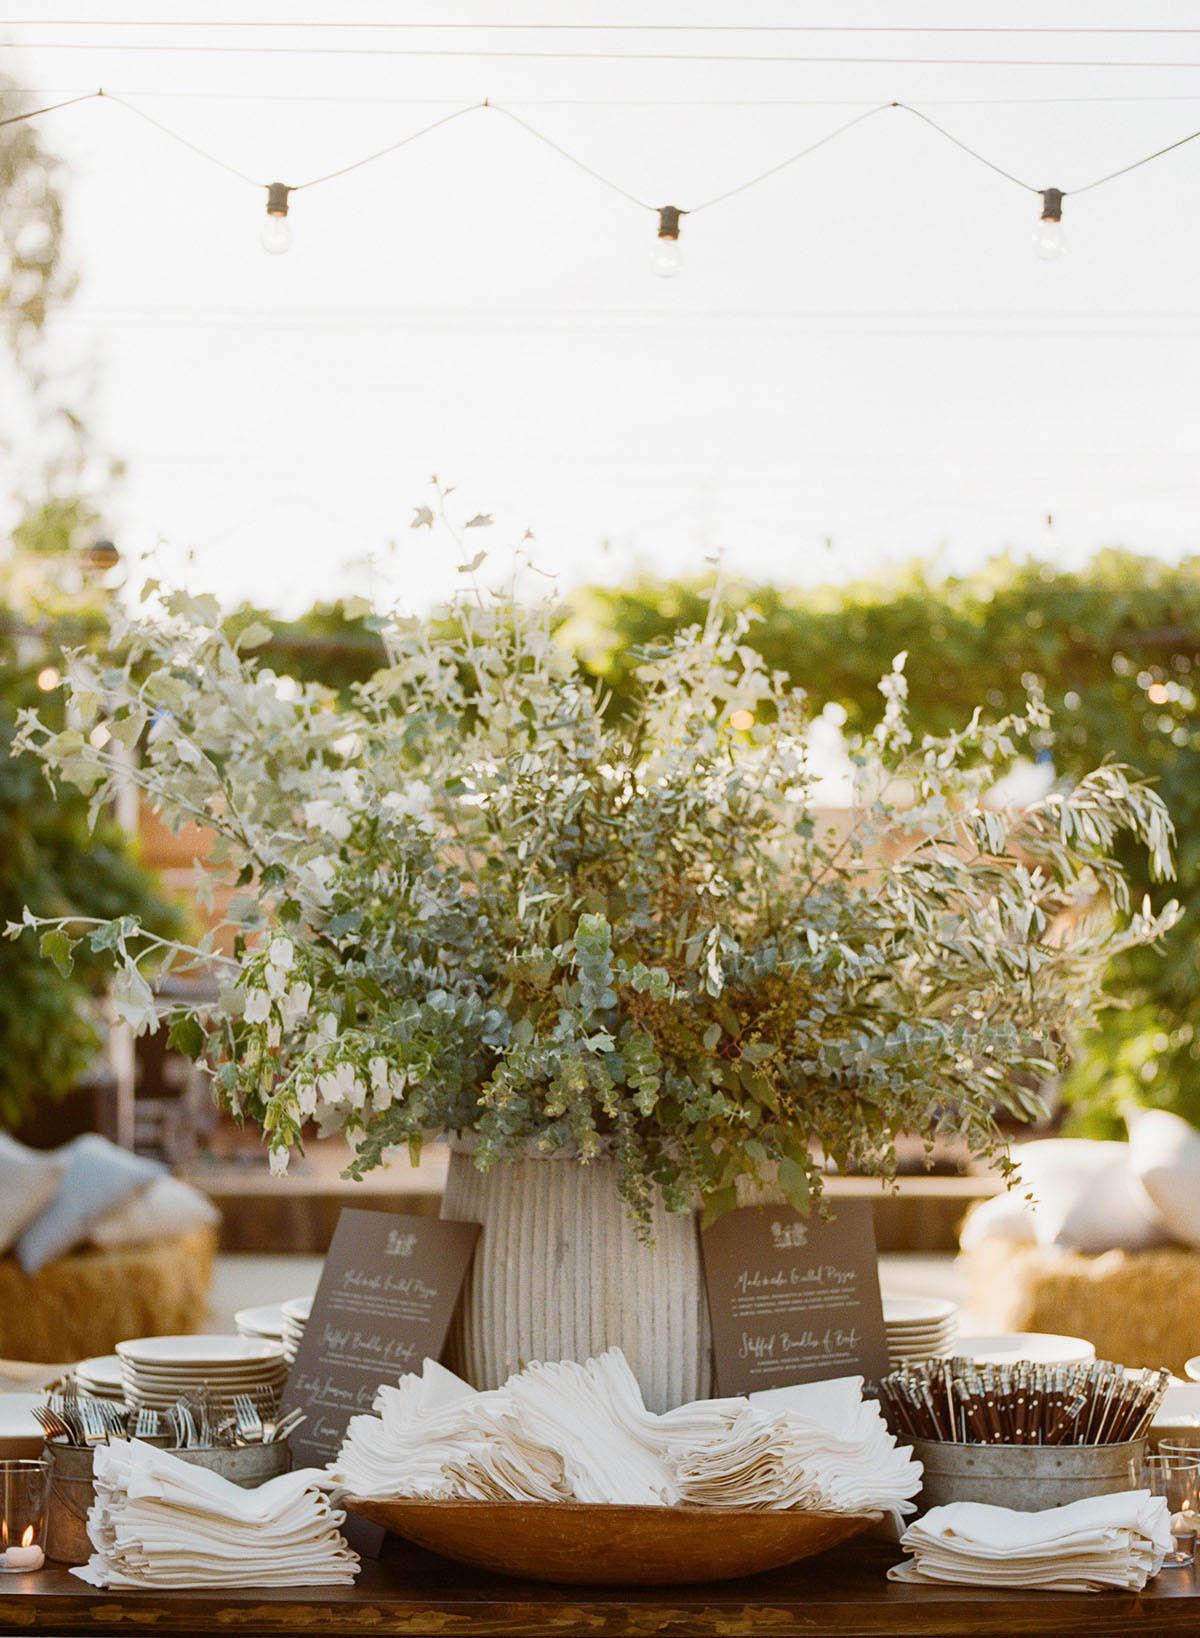 14-elegant-buffet-dinner-wedding.jpg